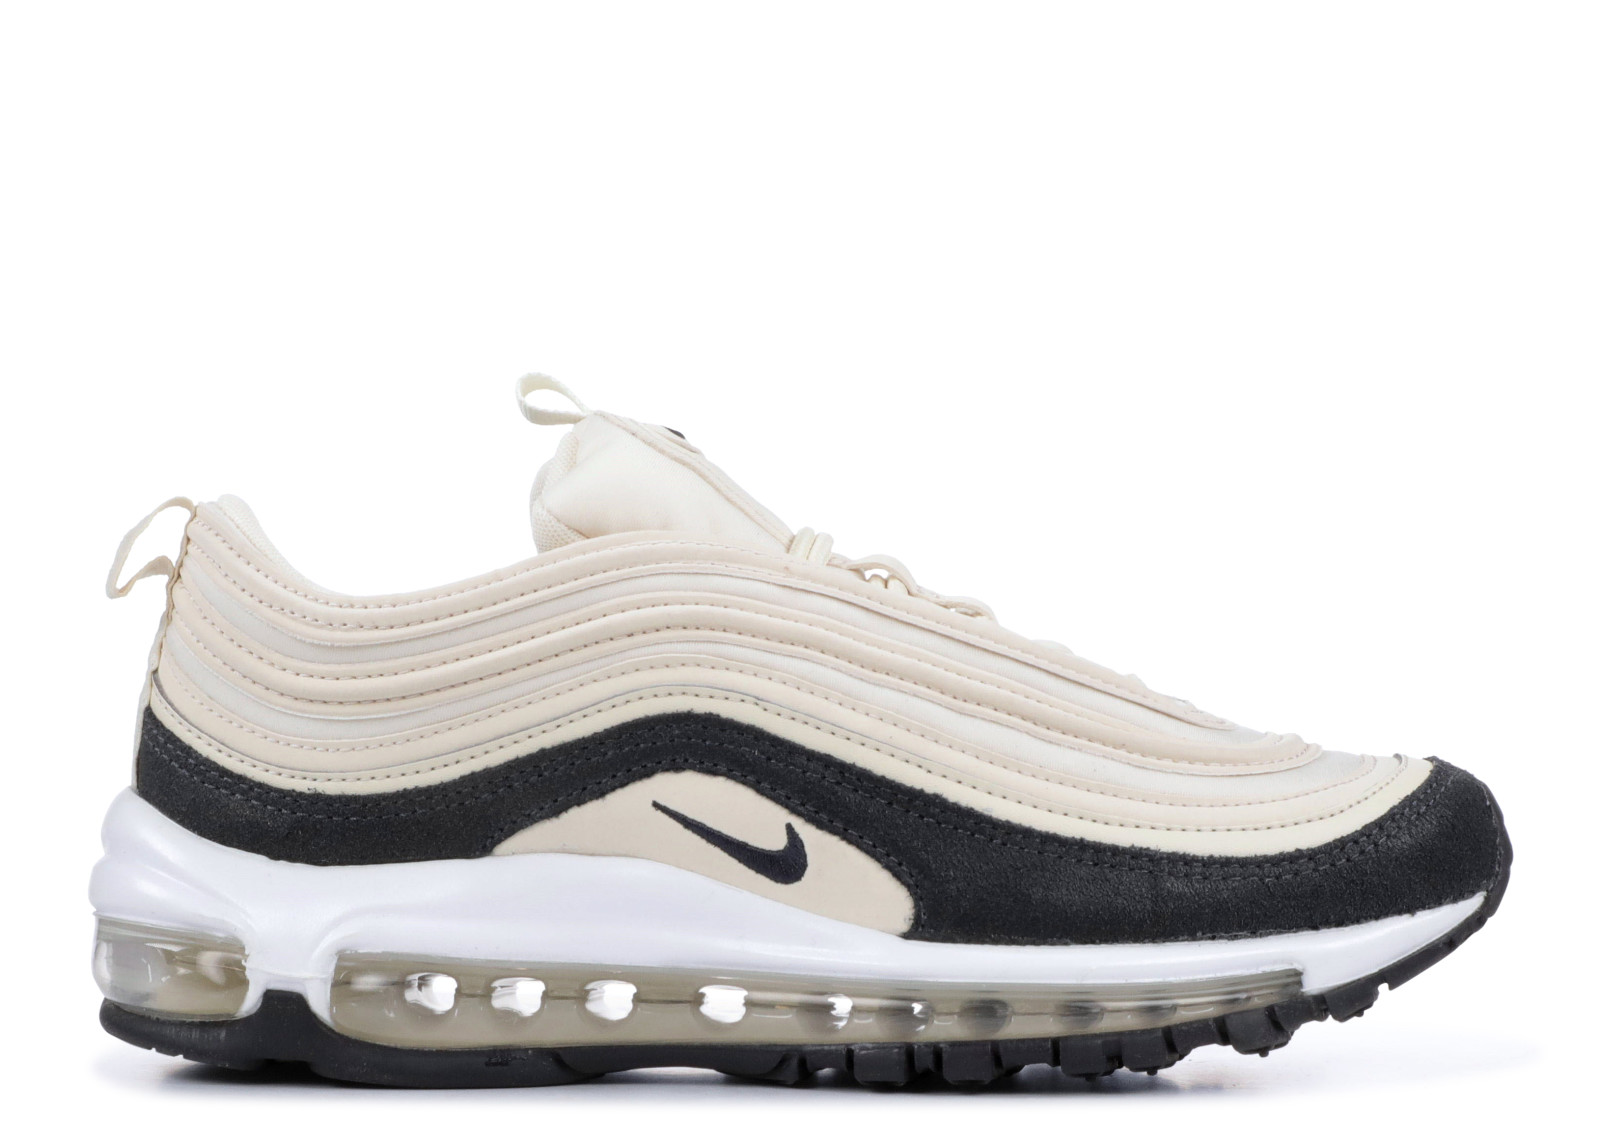 d39f372fbd Kick Avenue - Authentic Sneakers